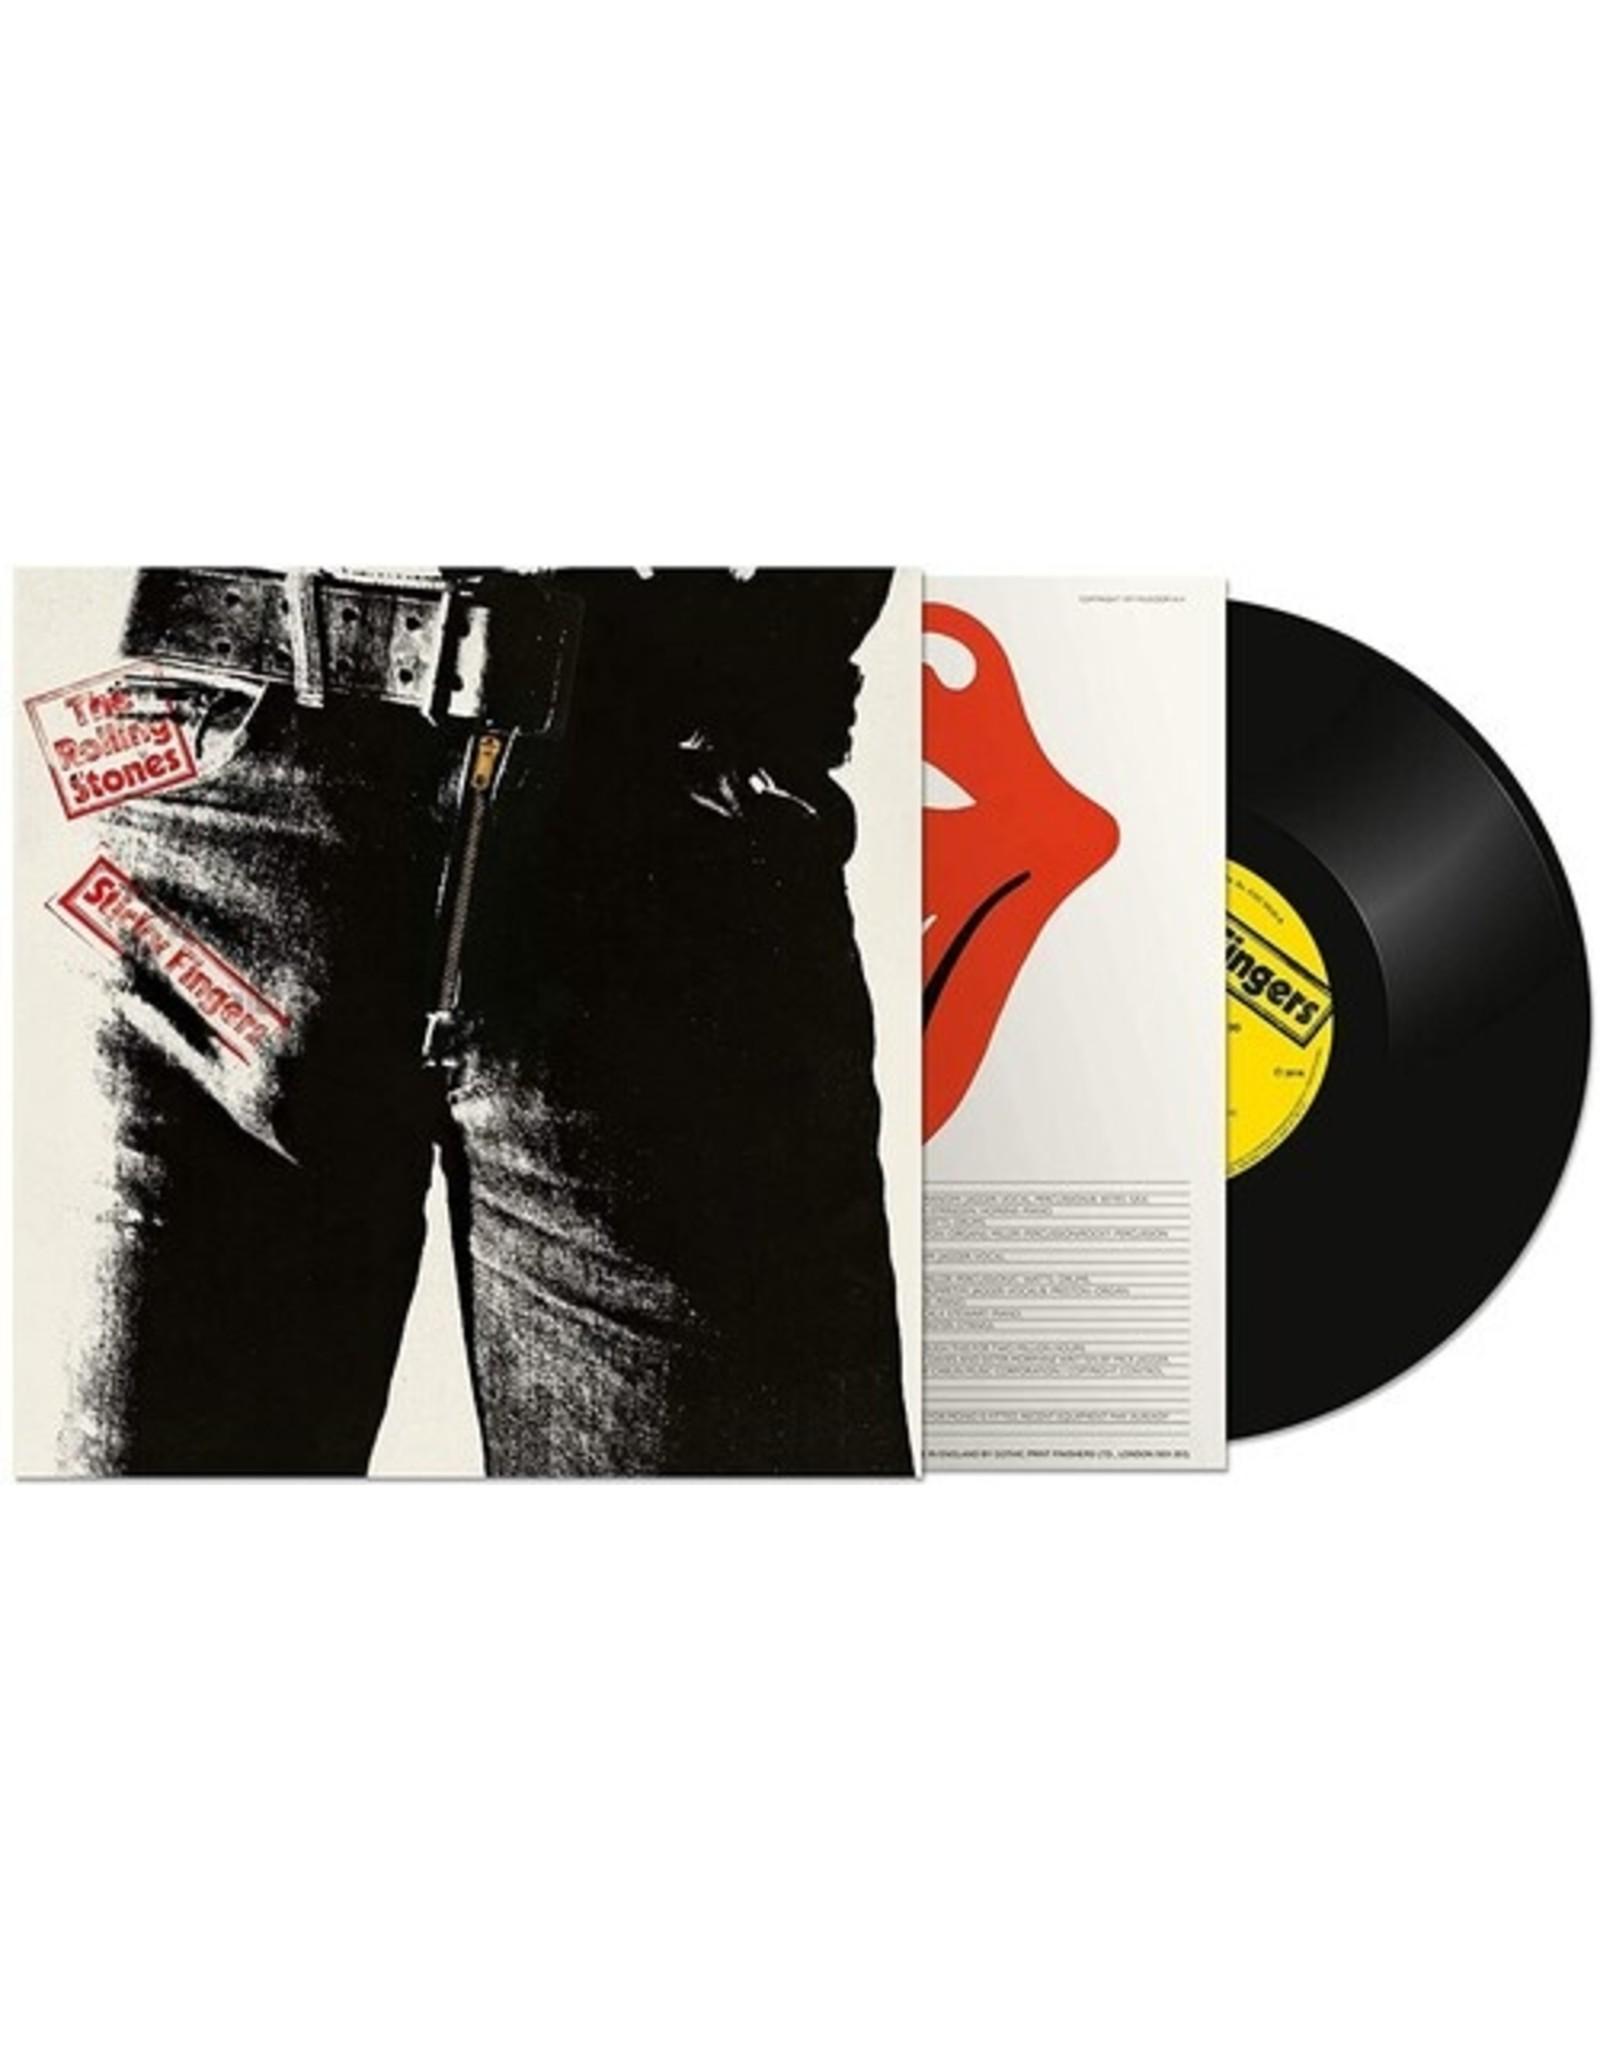 New Vinyl Rolling Stones - Sticky Fingers (Half-Speed Mastered, 180g) LP